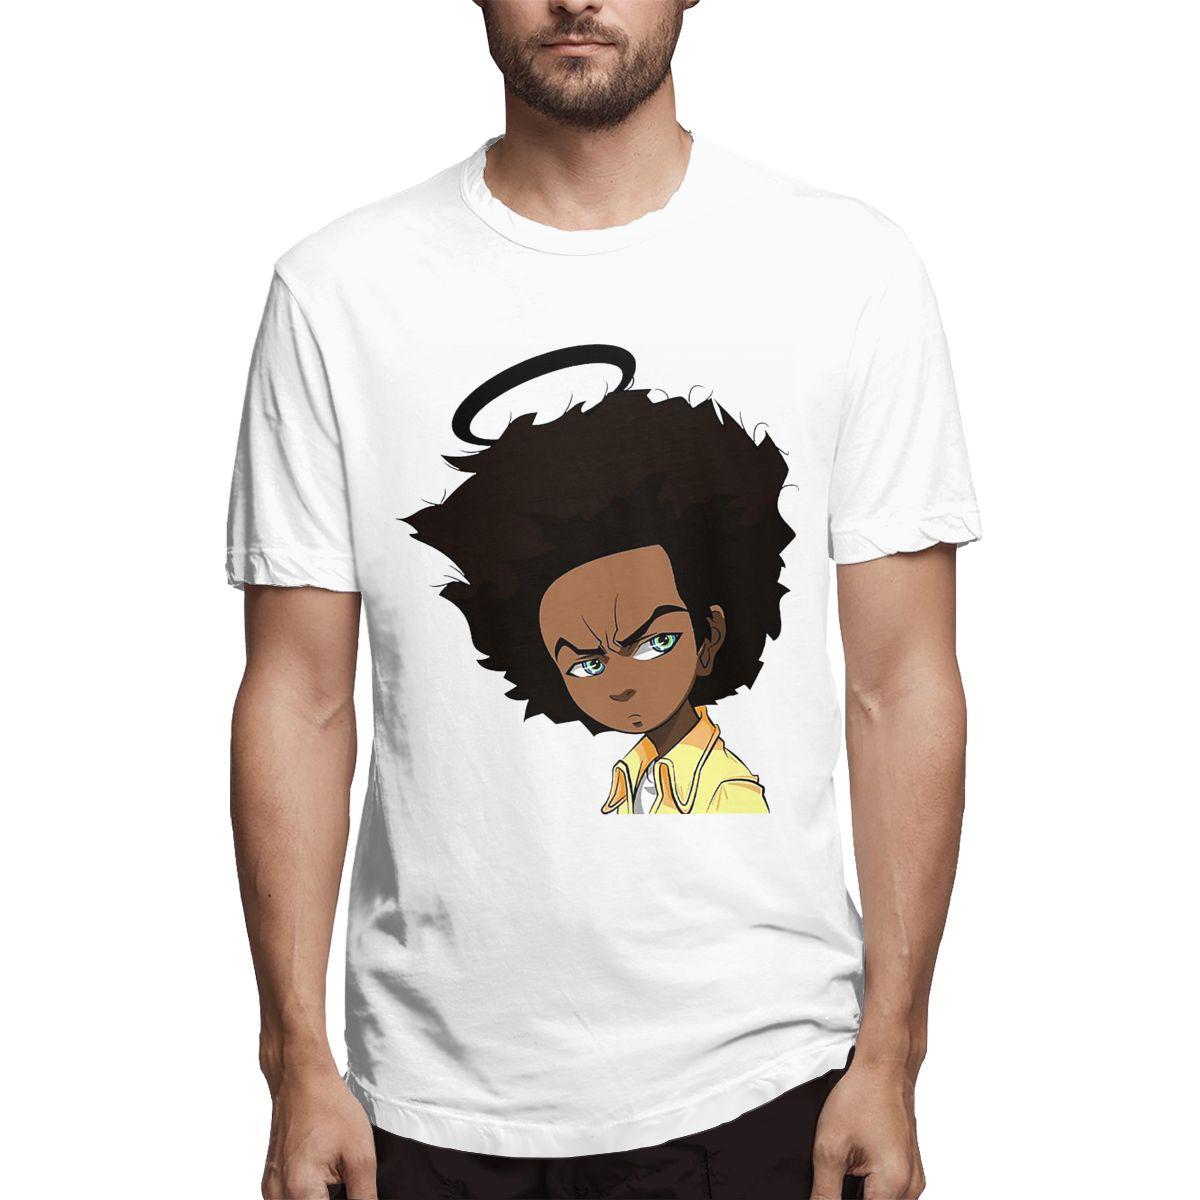 The Boondocks Boondocks Men's Cool Tees Short Sleeve O Neck T-Shirt 100% Cotton Printed Clothes